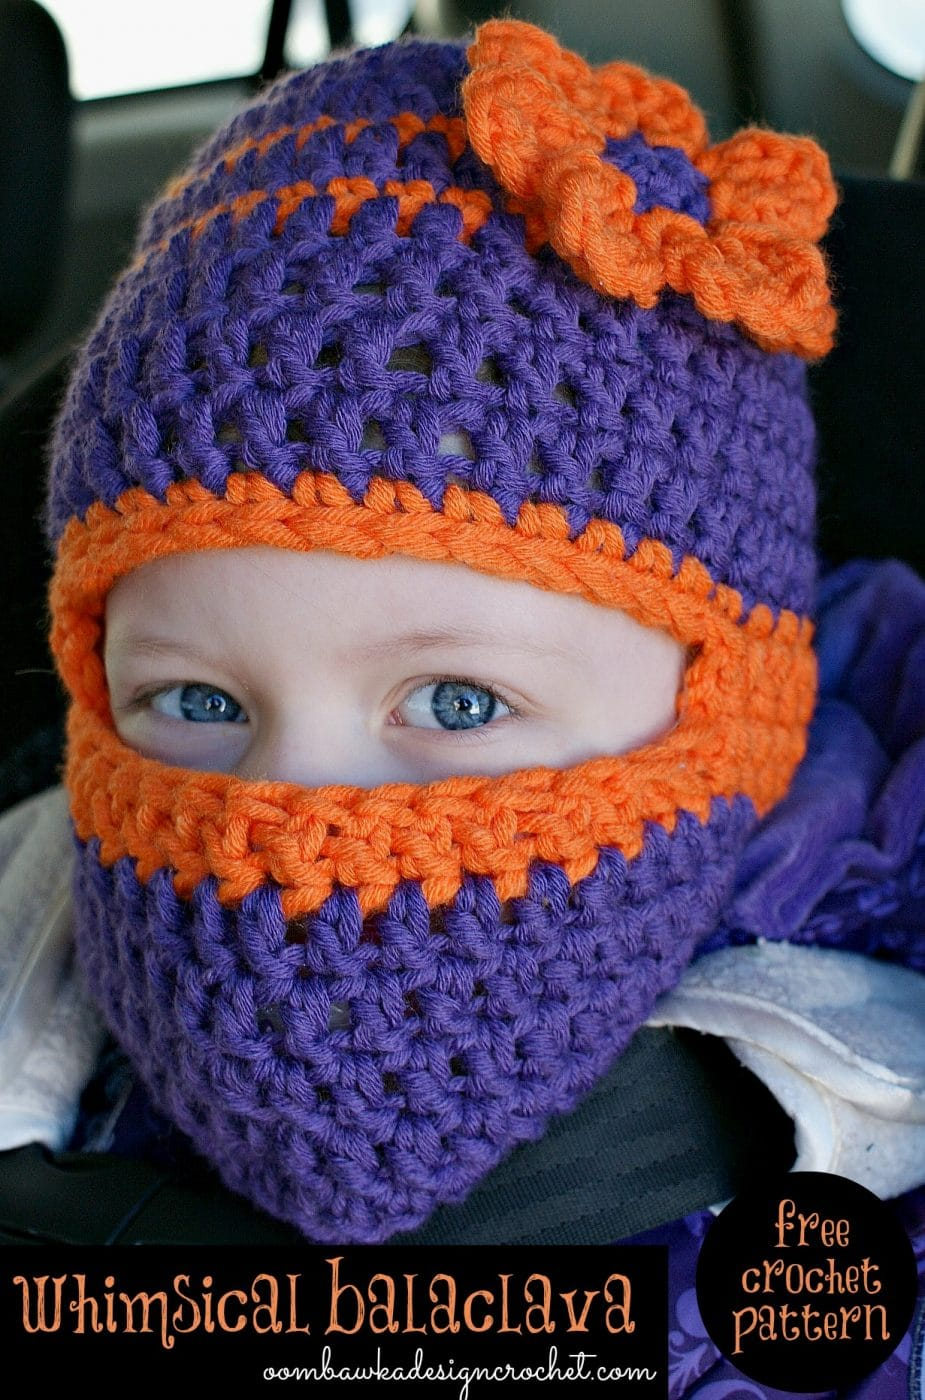 Free Knitting Pattern For Dog Balaclava : Whimsical Balaclava Free Crochet Pattern   Oombawka Design Crochet